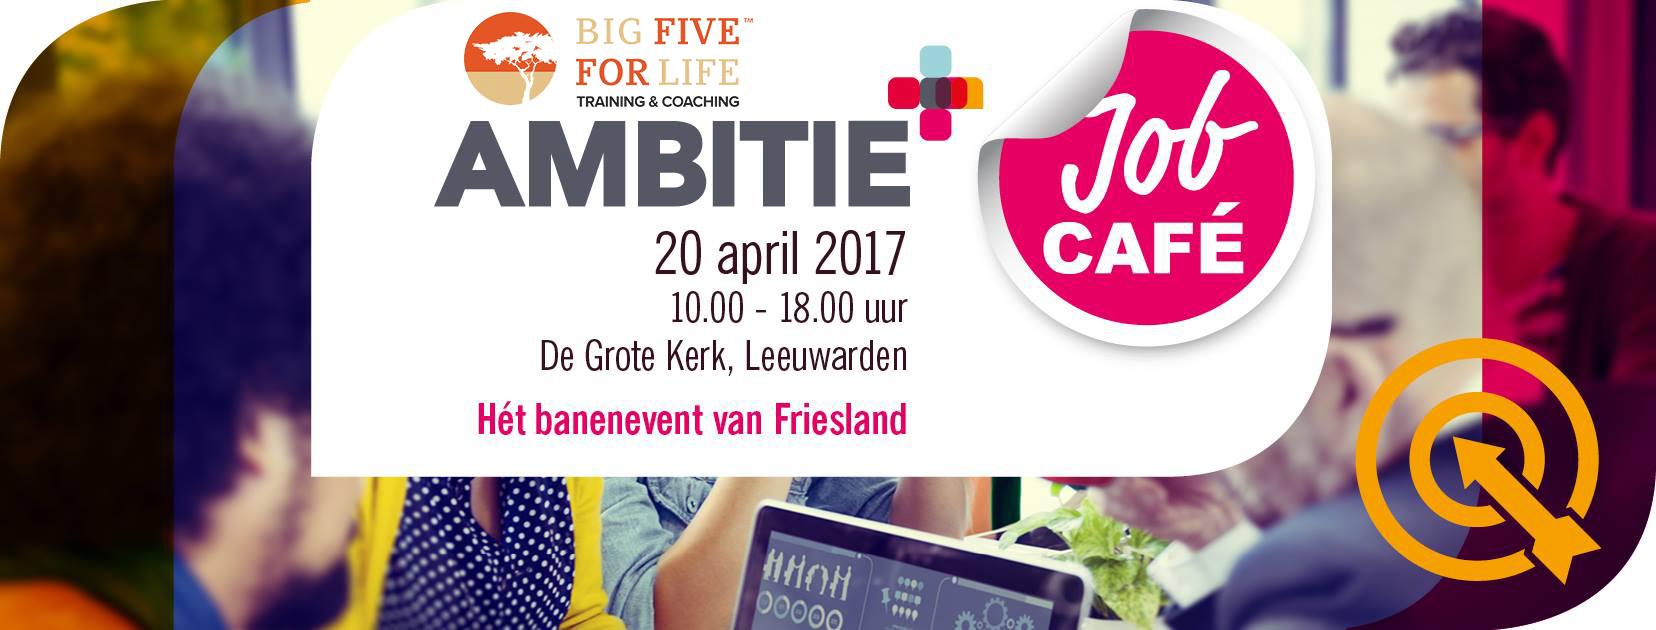 Big Five for Life Ambitie Jobcafé